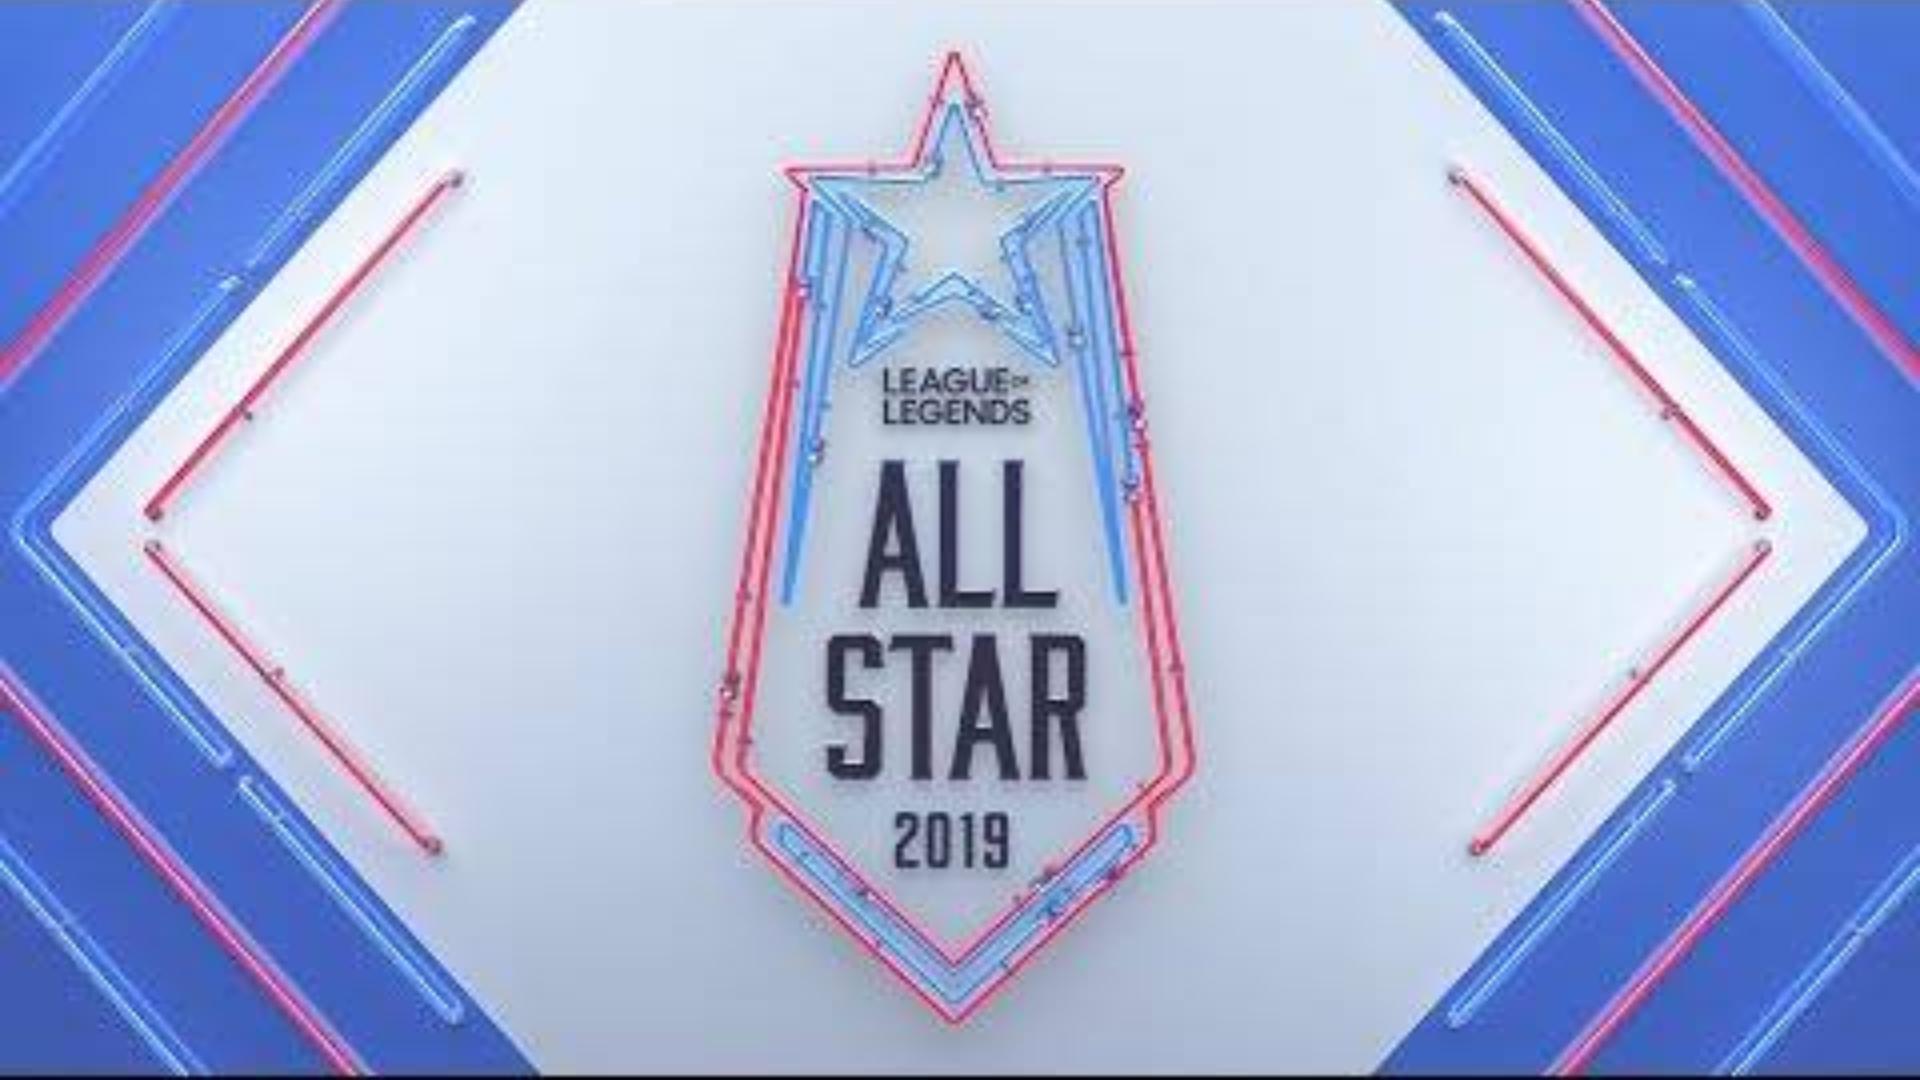 快速看完2019Allstar全明星赛 Day1